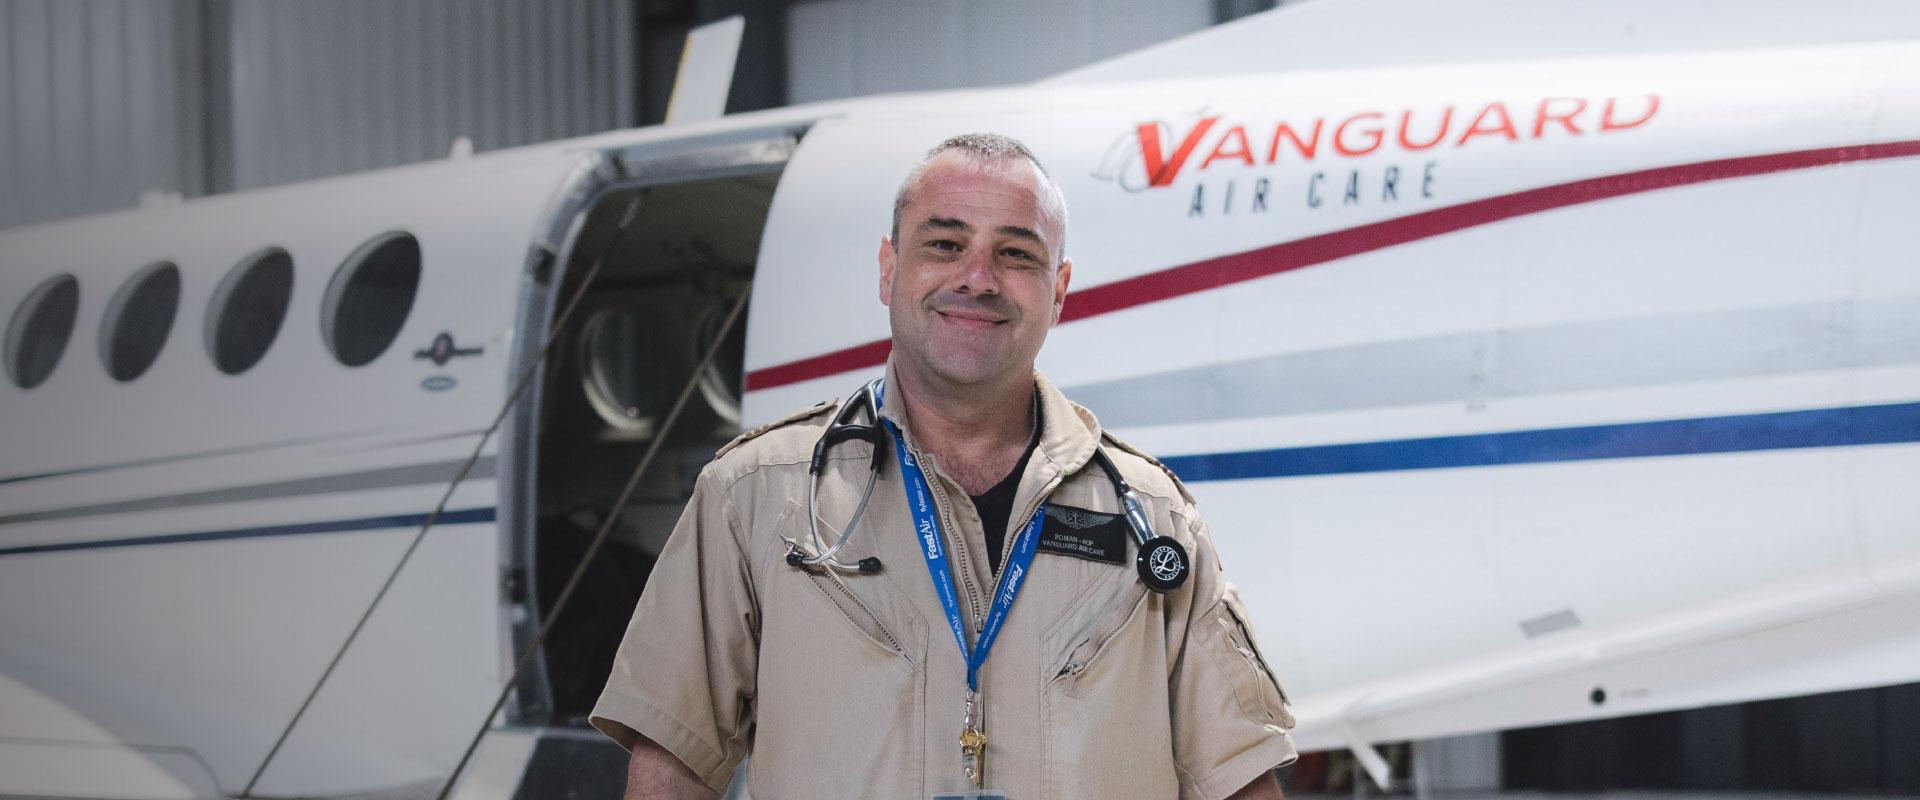 Vangaurd Medical Professional